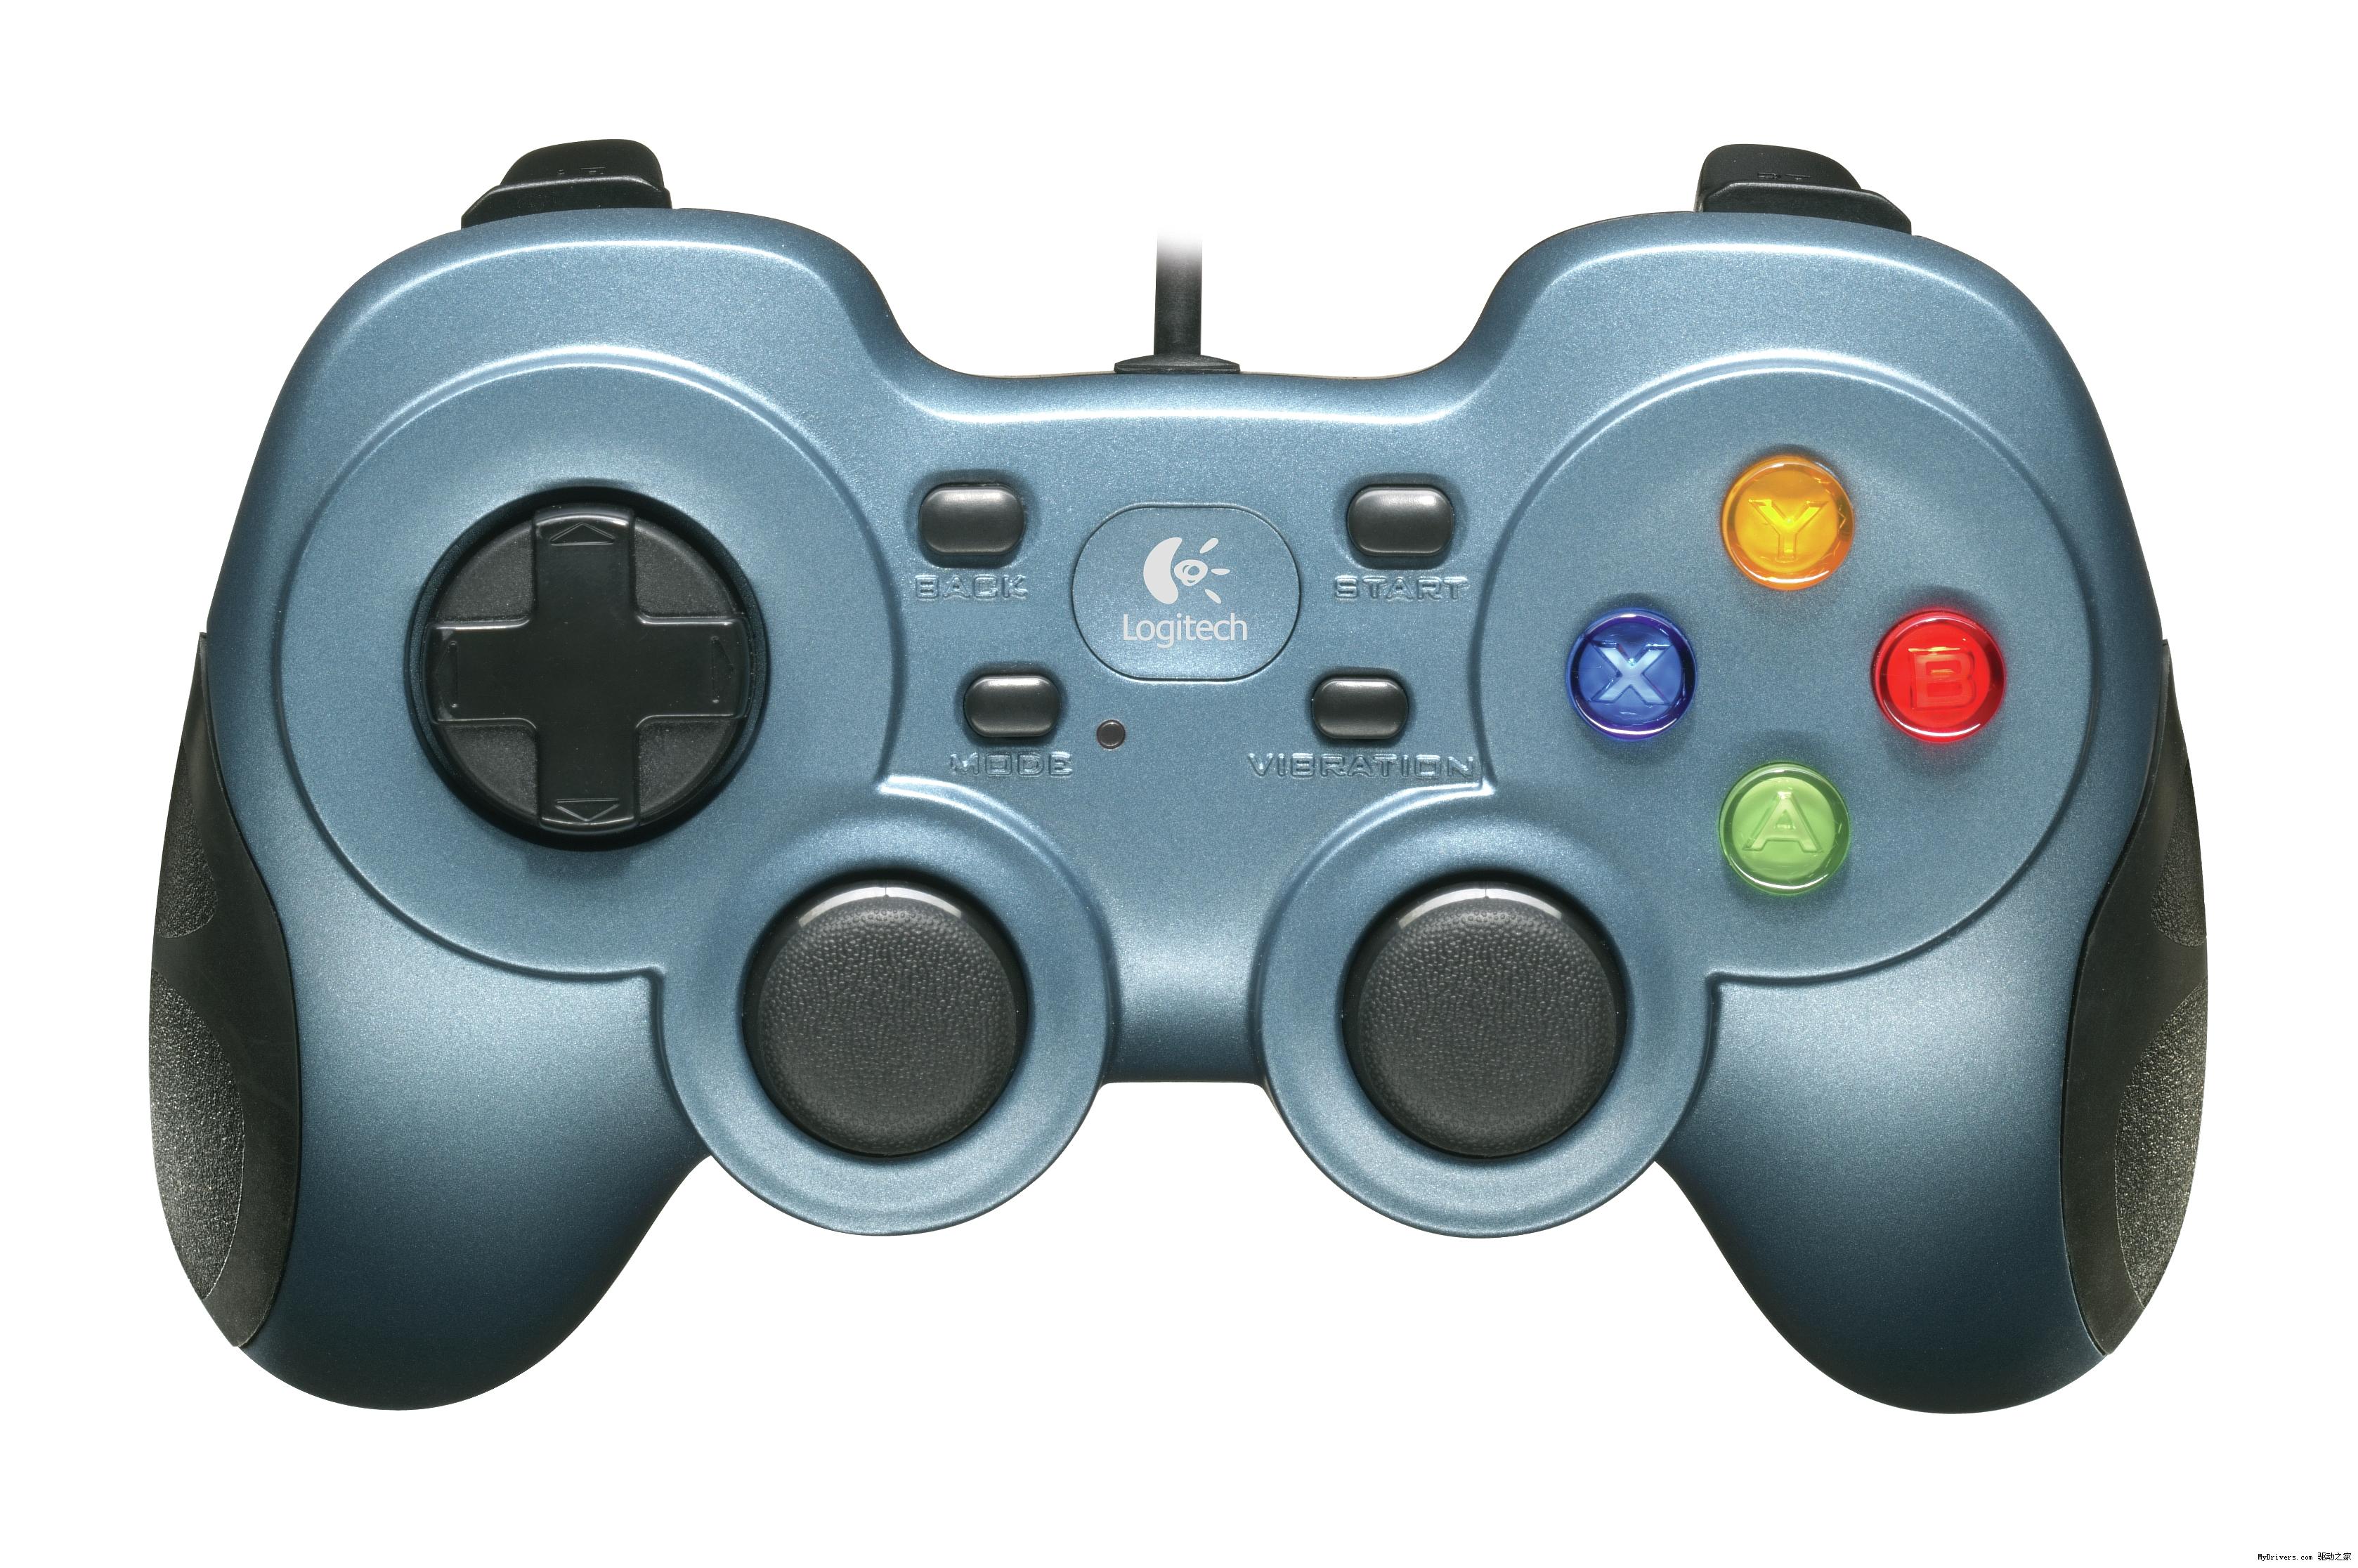 game pad drivers: